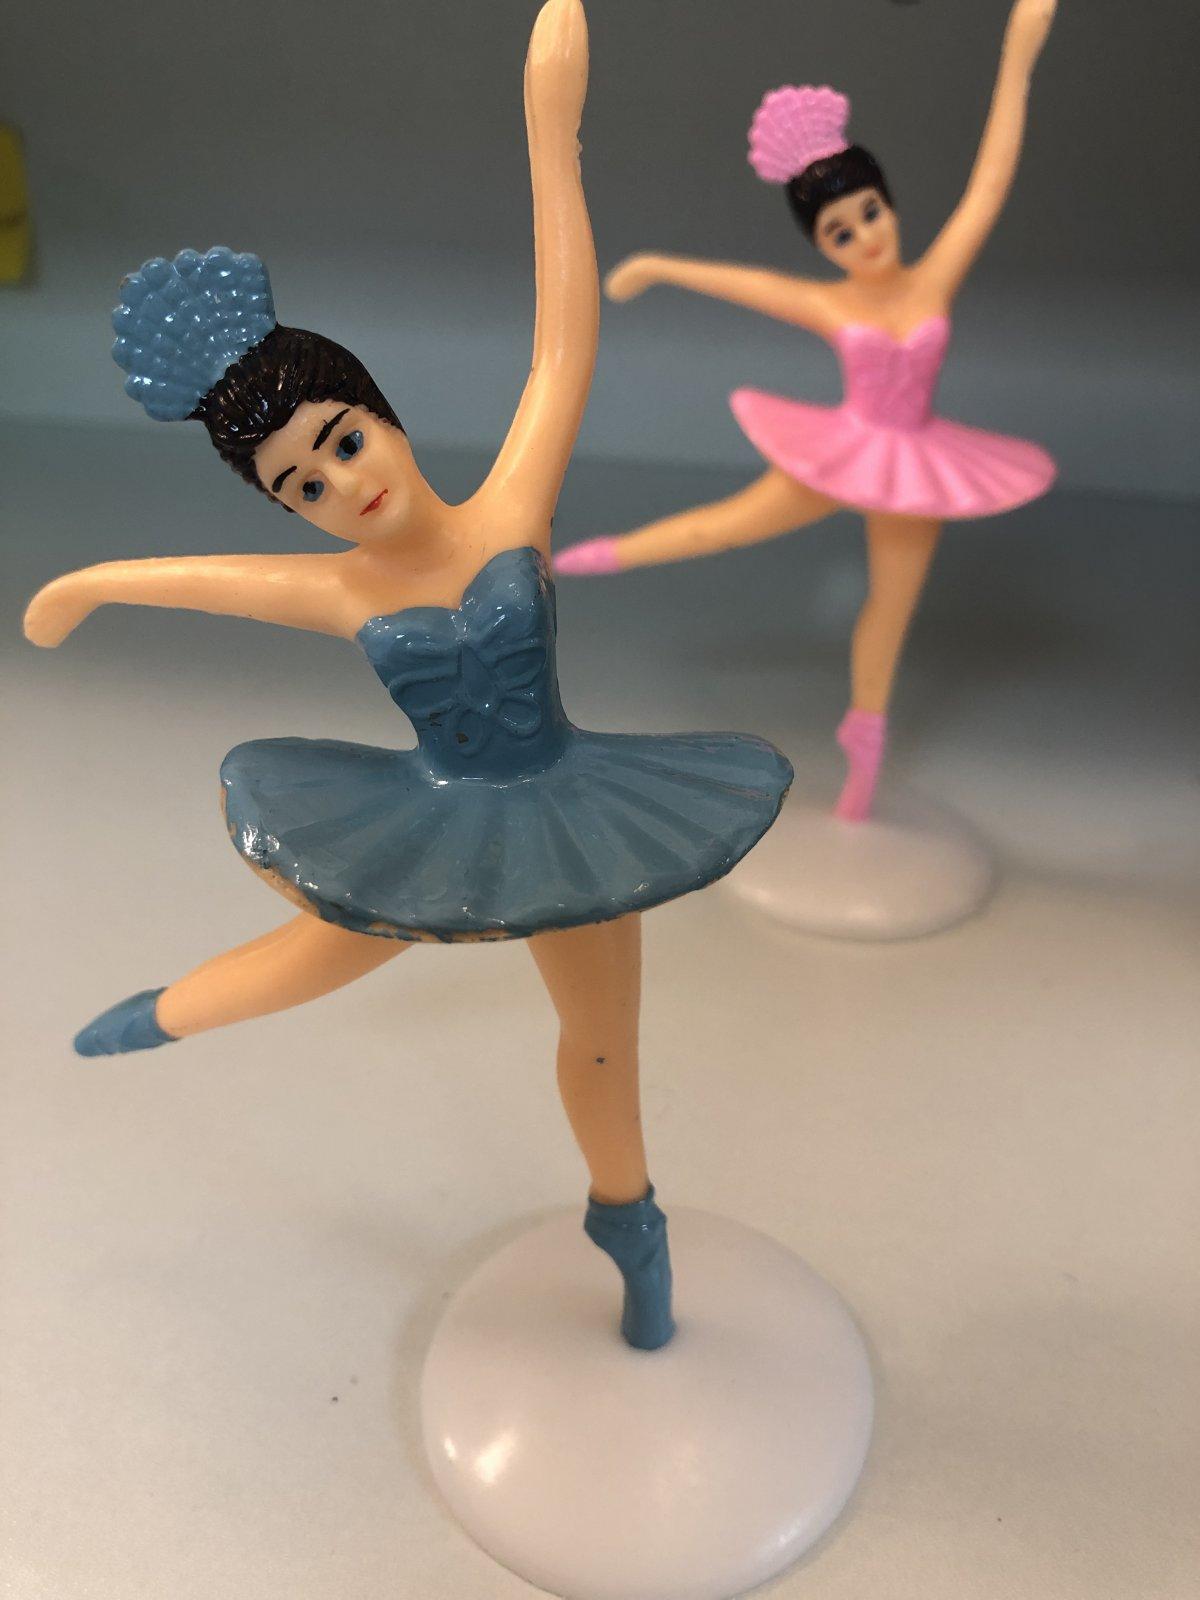 Ballerina Dancing 5 Pink Tutu